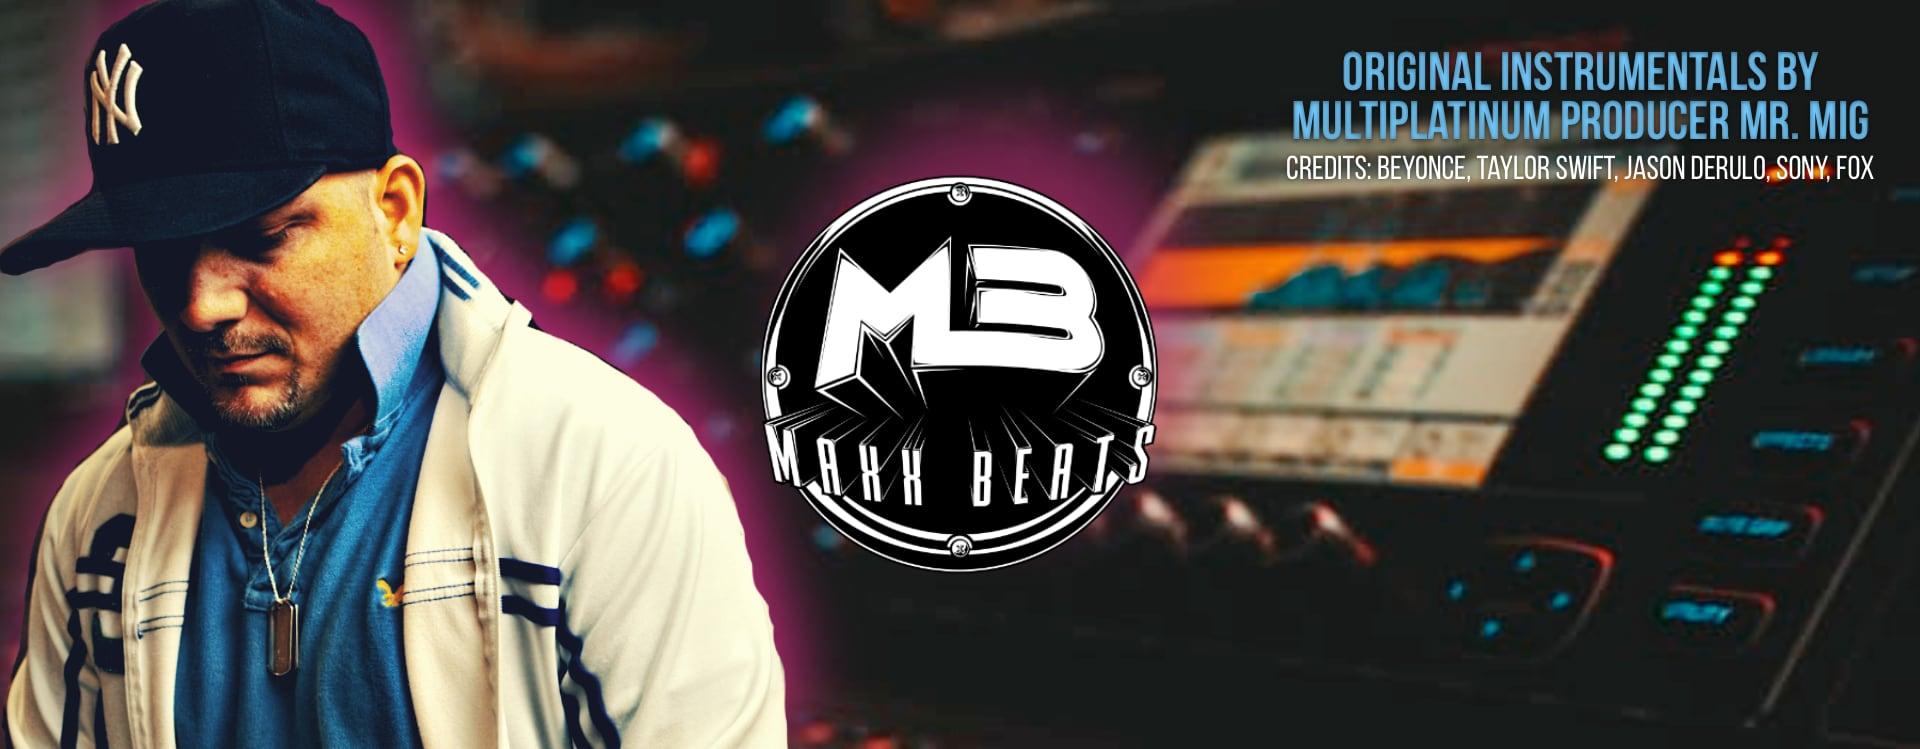 maxxbeats-banner-8.7.20-7